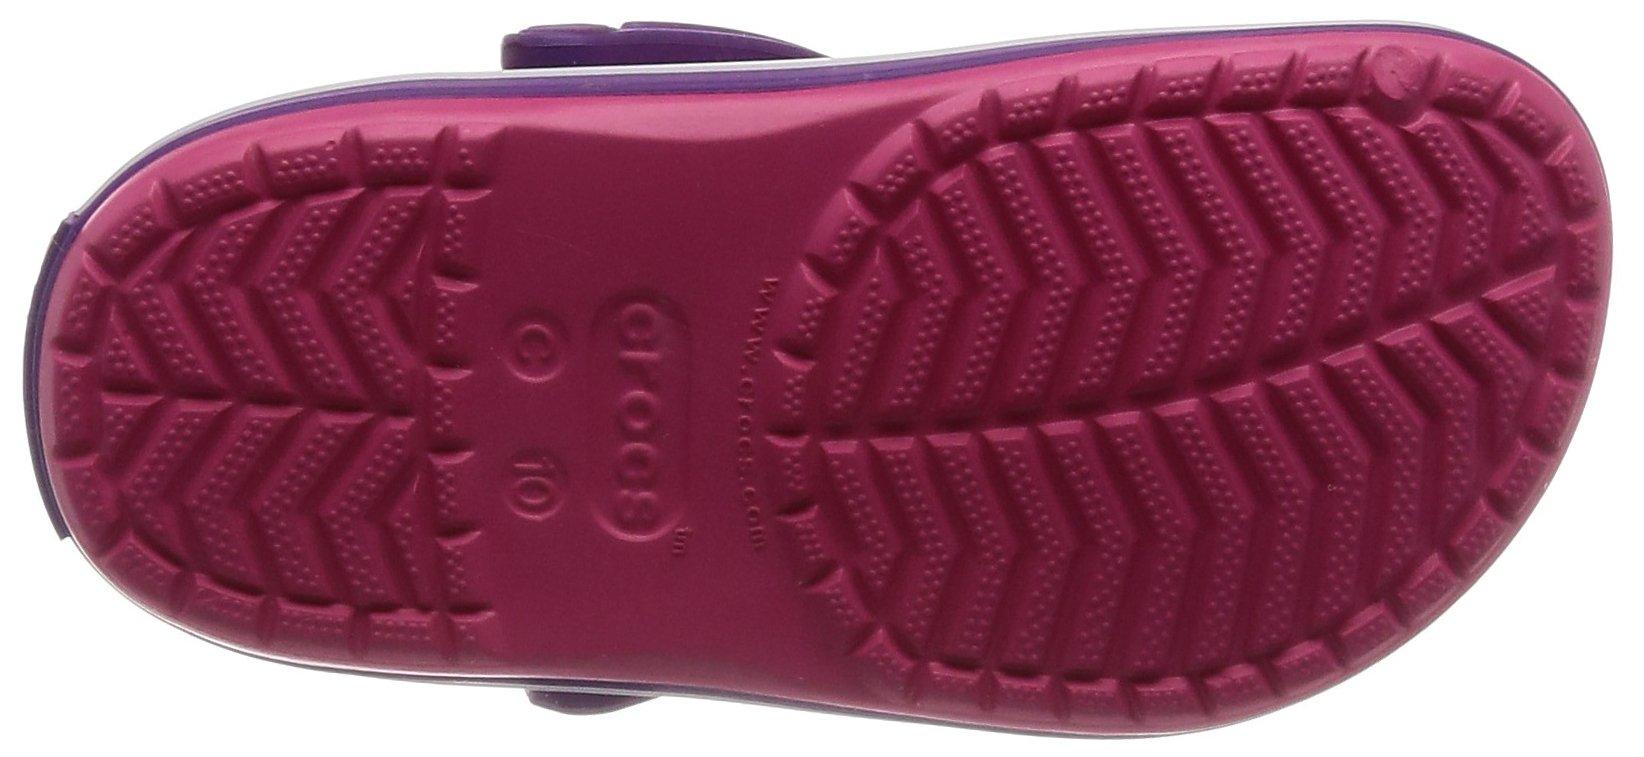 Crocs Kids' Crocband Clog, Paradise Pink/Amethyst, 1 M US Little by Crocs (Image #3)